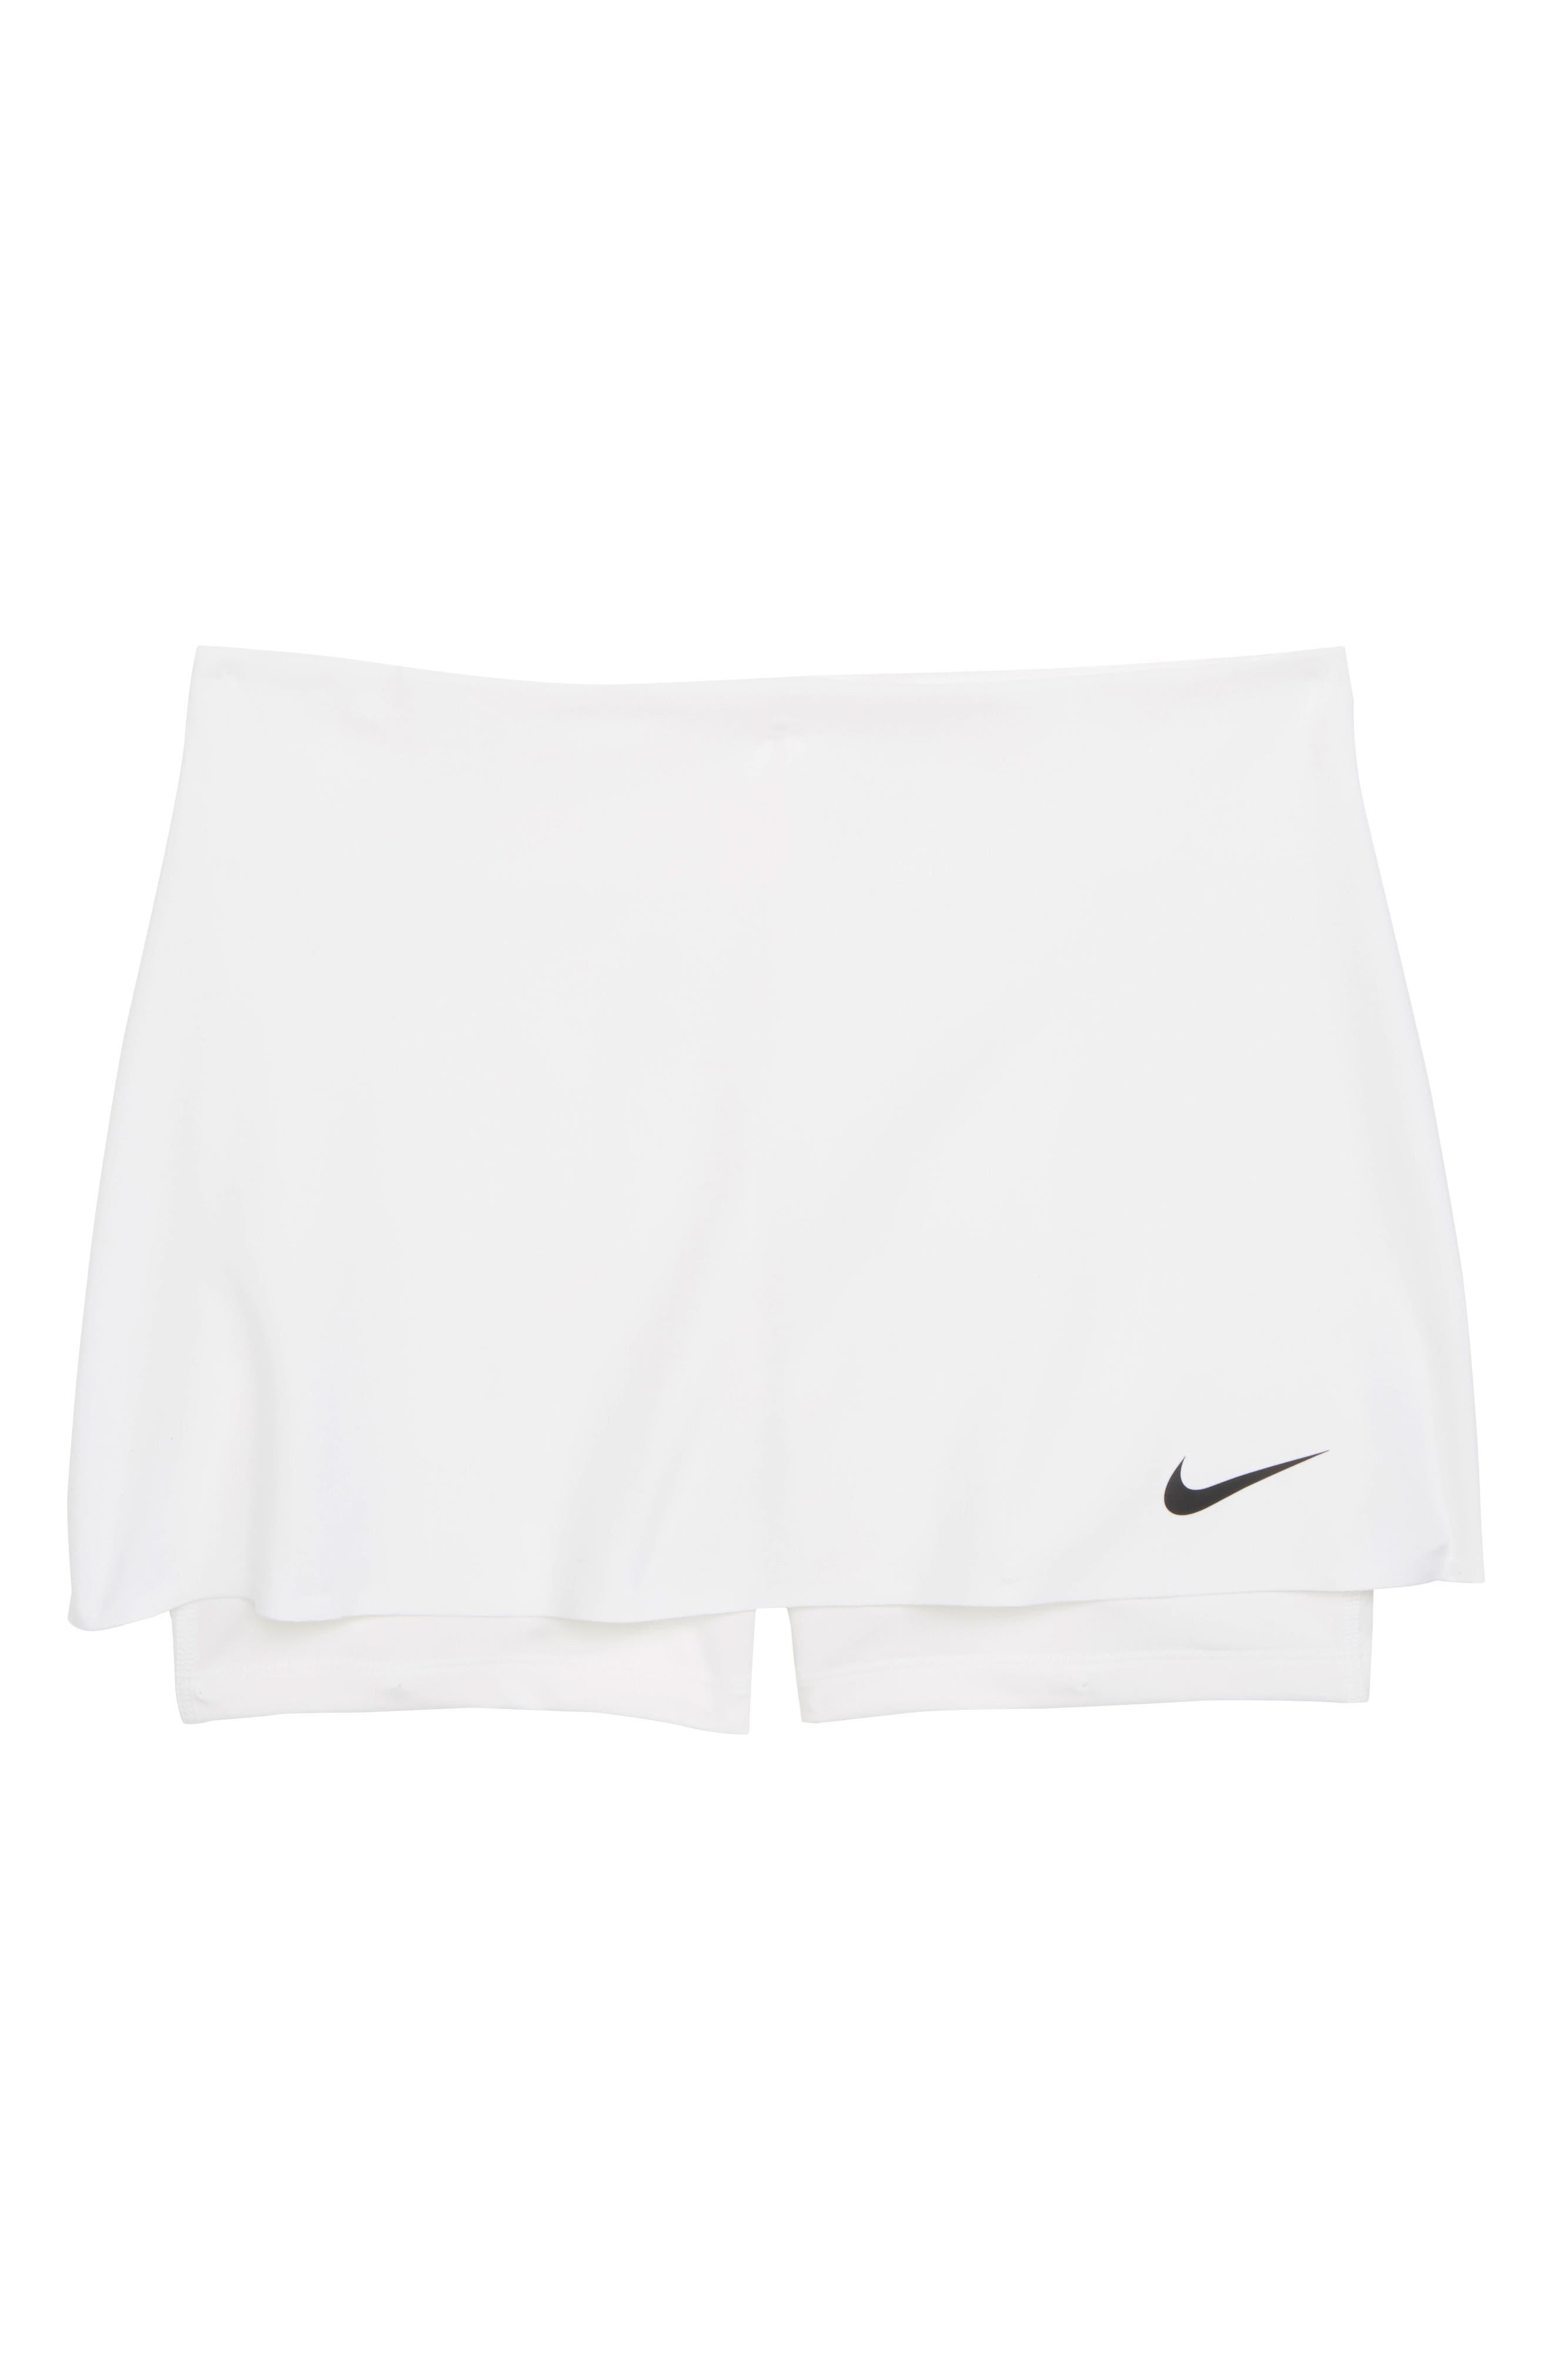 Power Tennis Skirt,                             Main thumbnail 3, color,